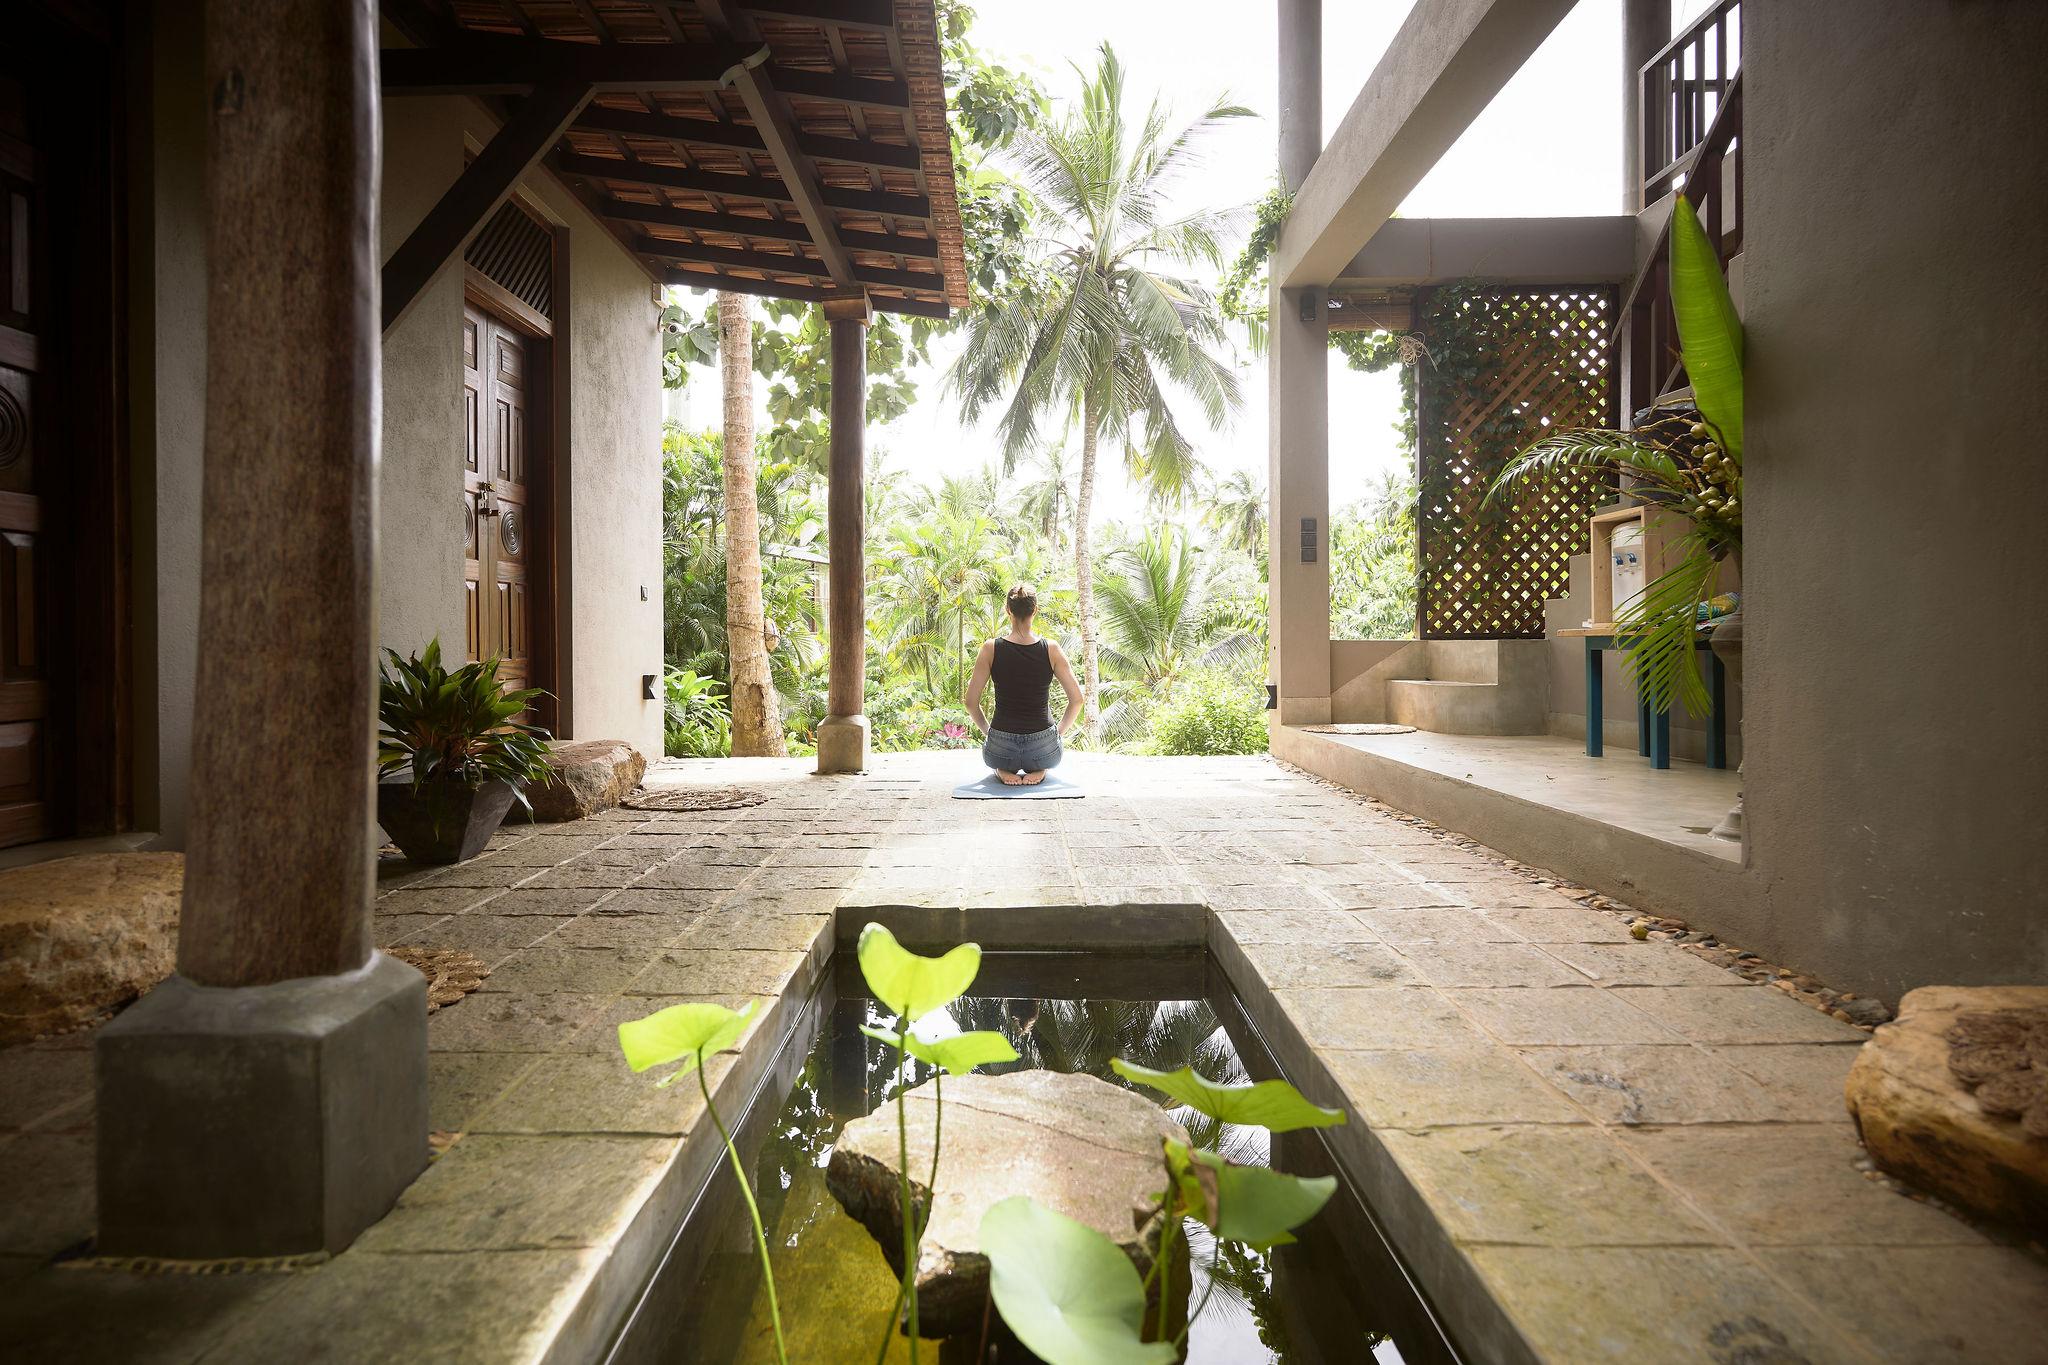 A true gem, eco-friendly guesthouse close to Hiriketiya beach with luscious jungle surroundings